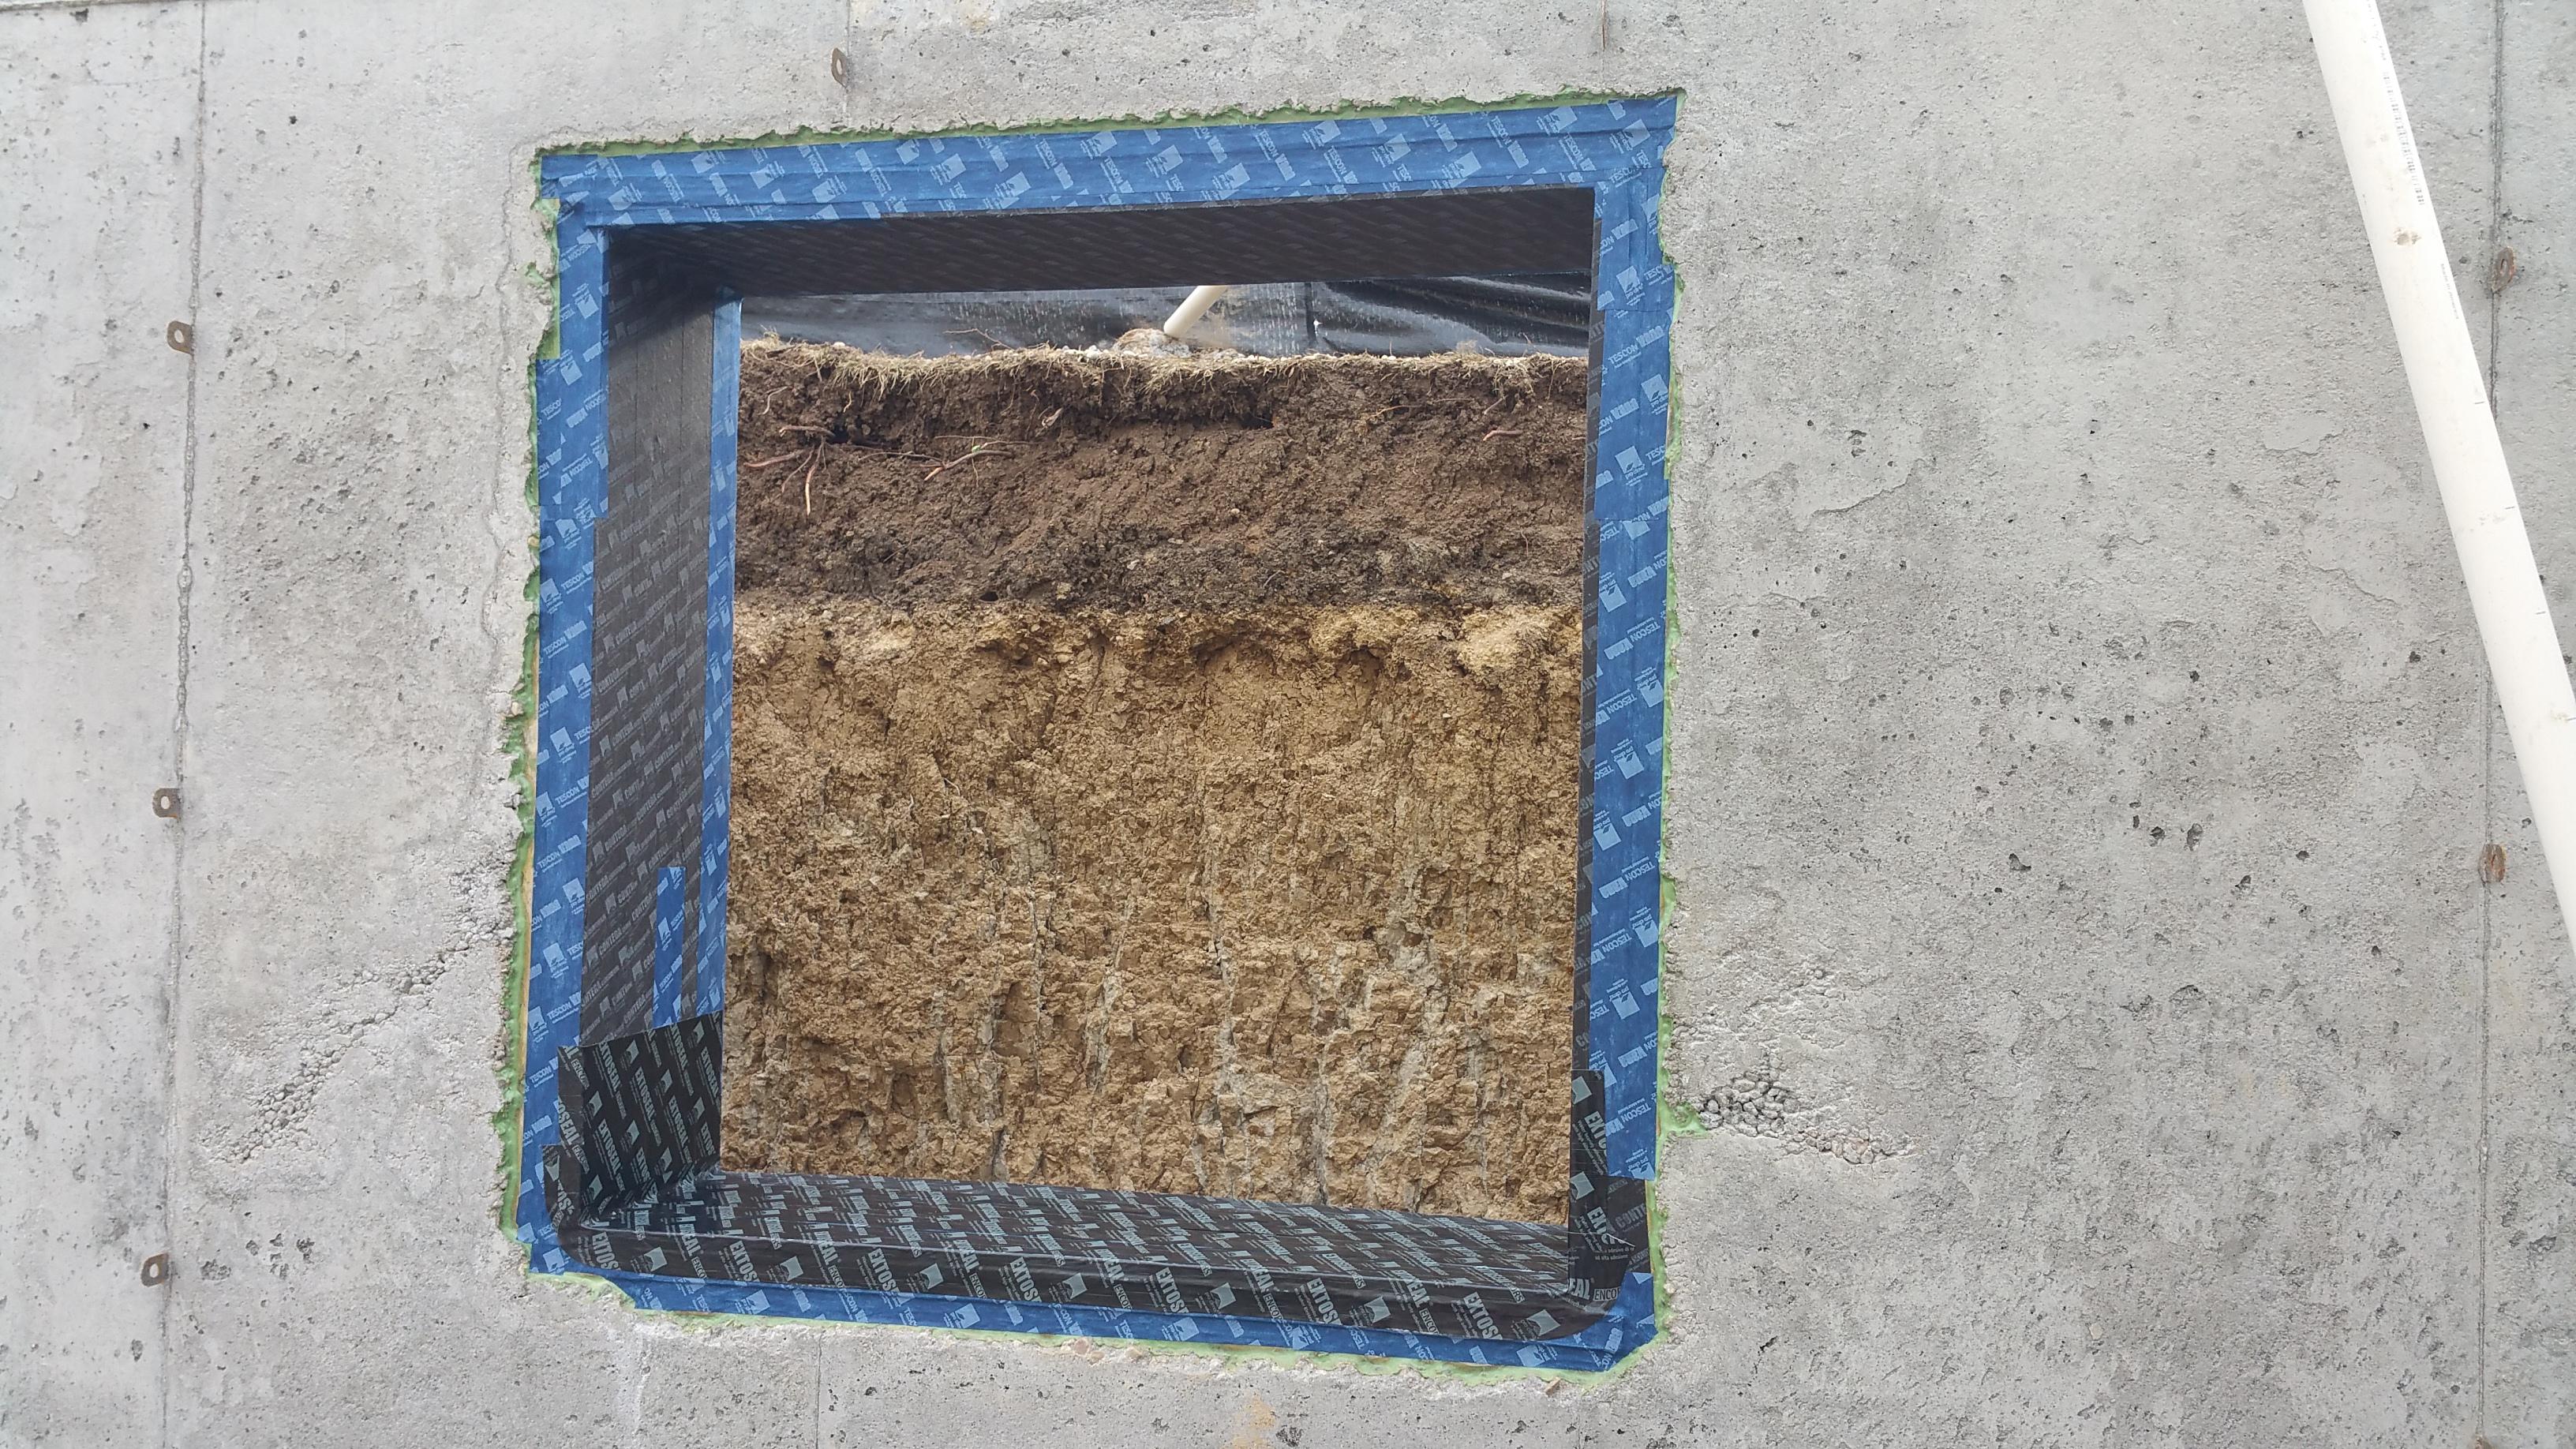 basement-window-buck-covered-in-tape